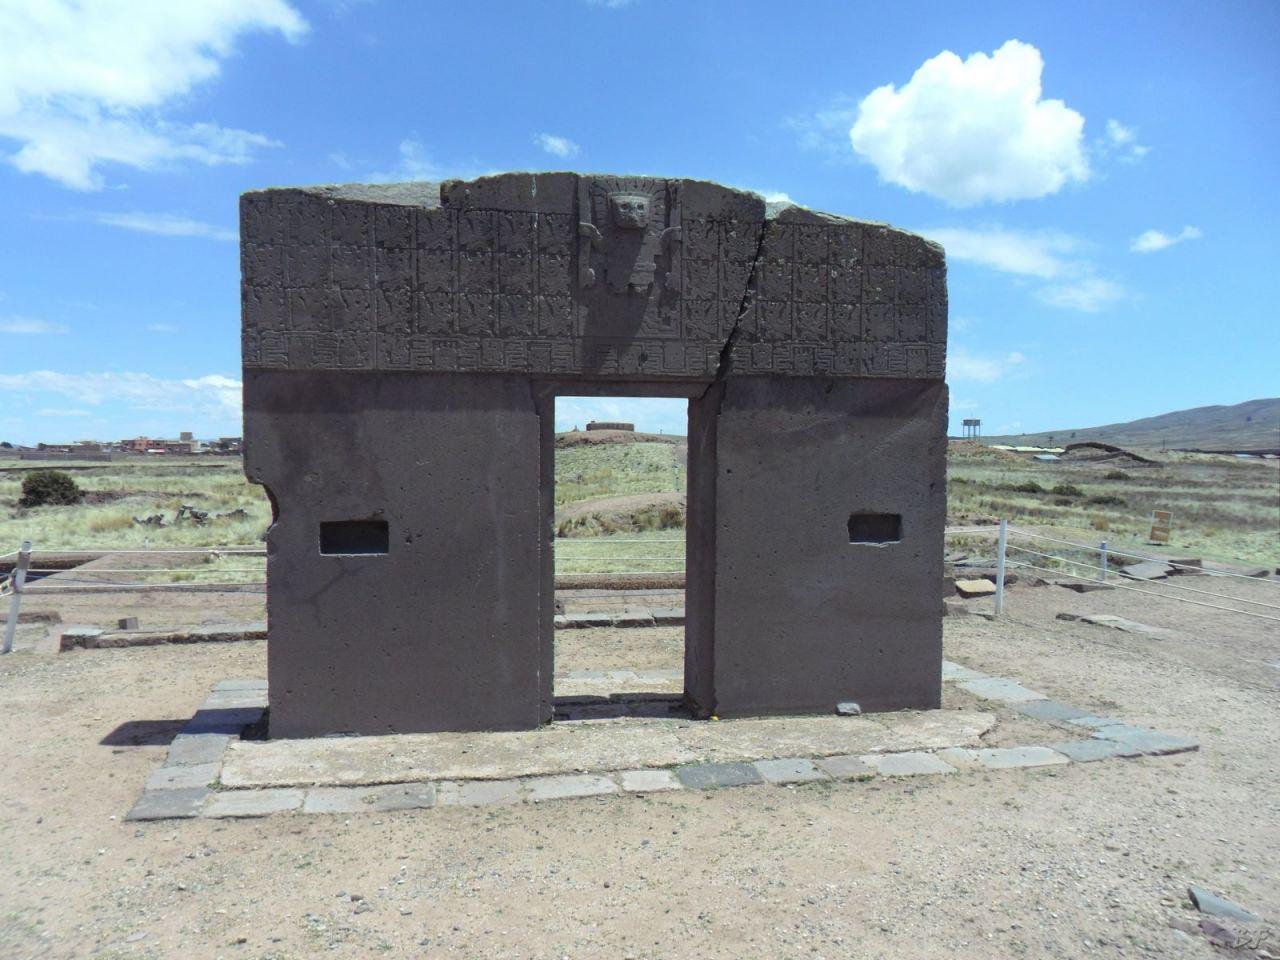 Sito-Megalitico-Piramide-Akapana-Kalasasaya-Menhir-Tiahuanaco-Bolivia-26